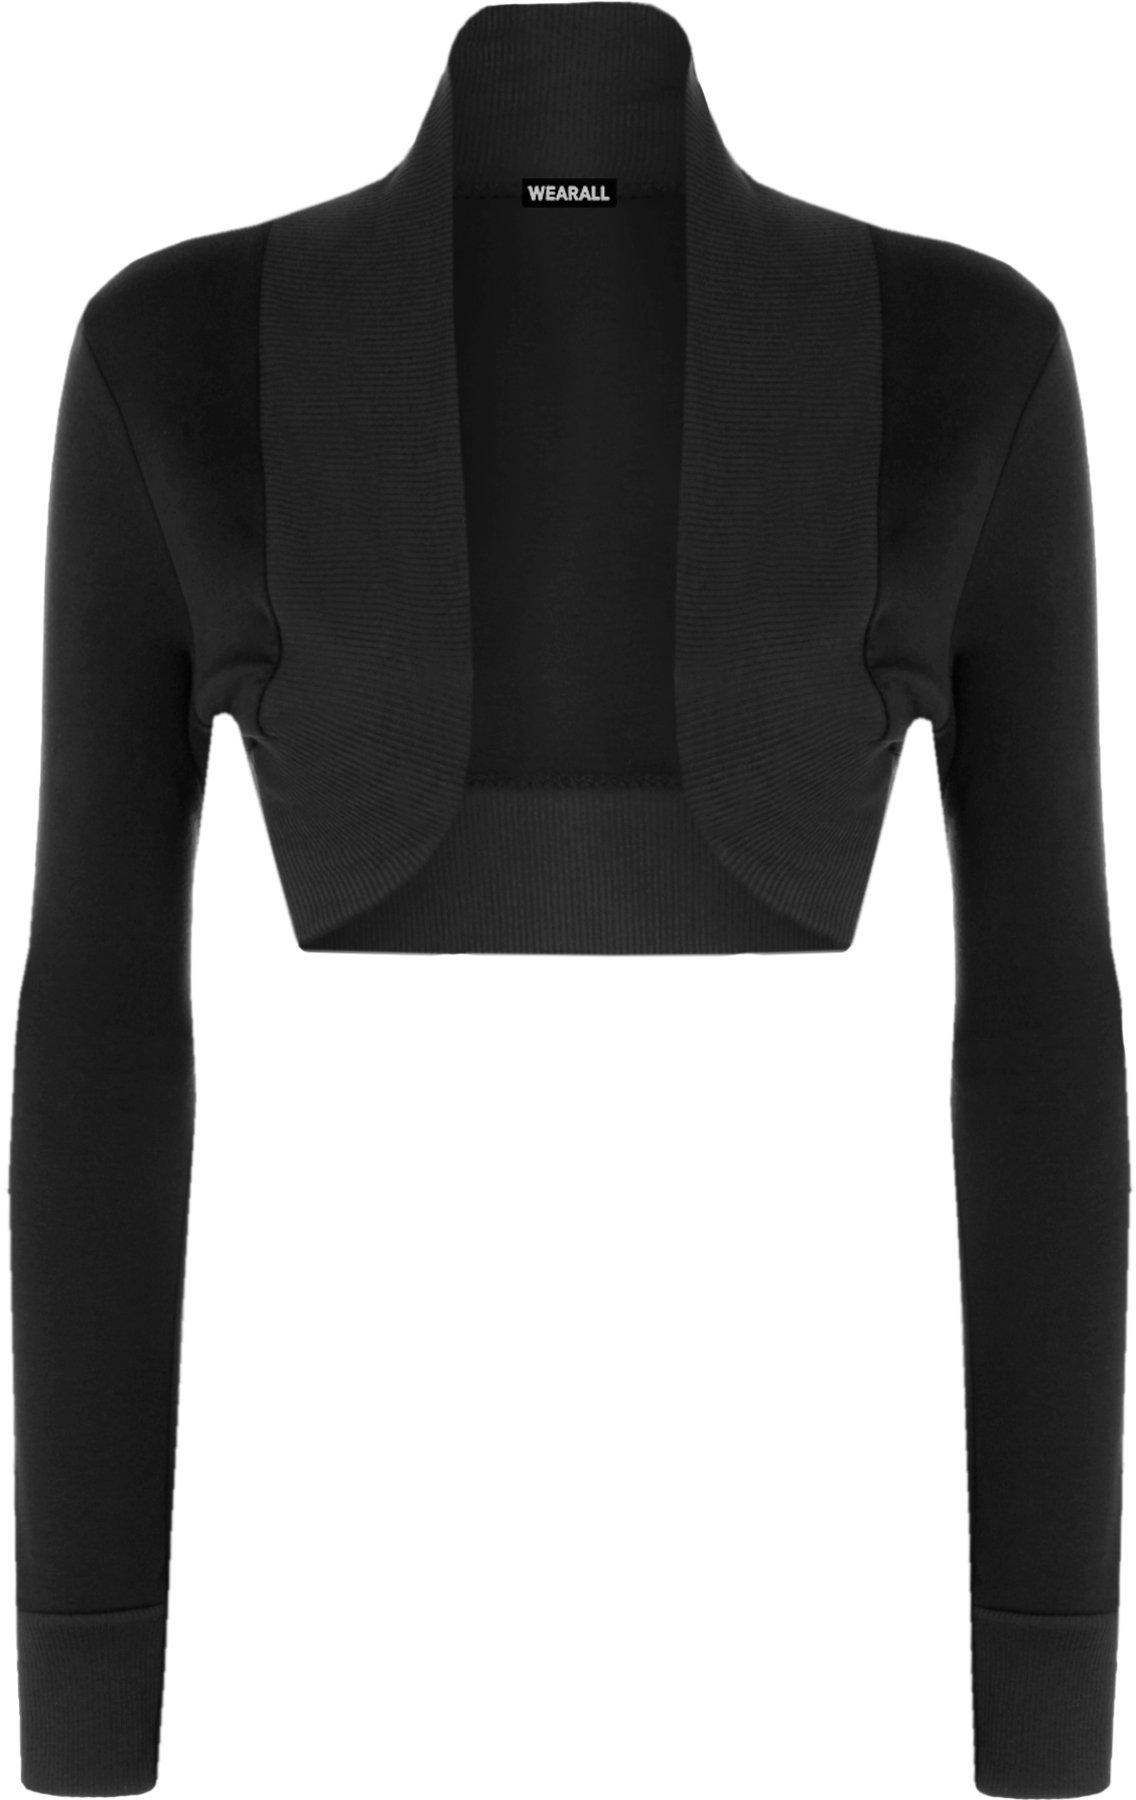 WearAll Women's Shrug Long Sleeve Ladies Bolero Top - Black - US 8-10 (UK 12-14)